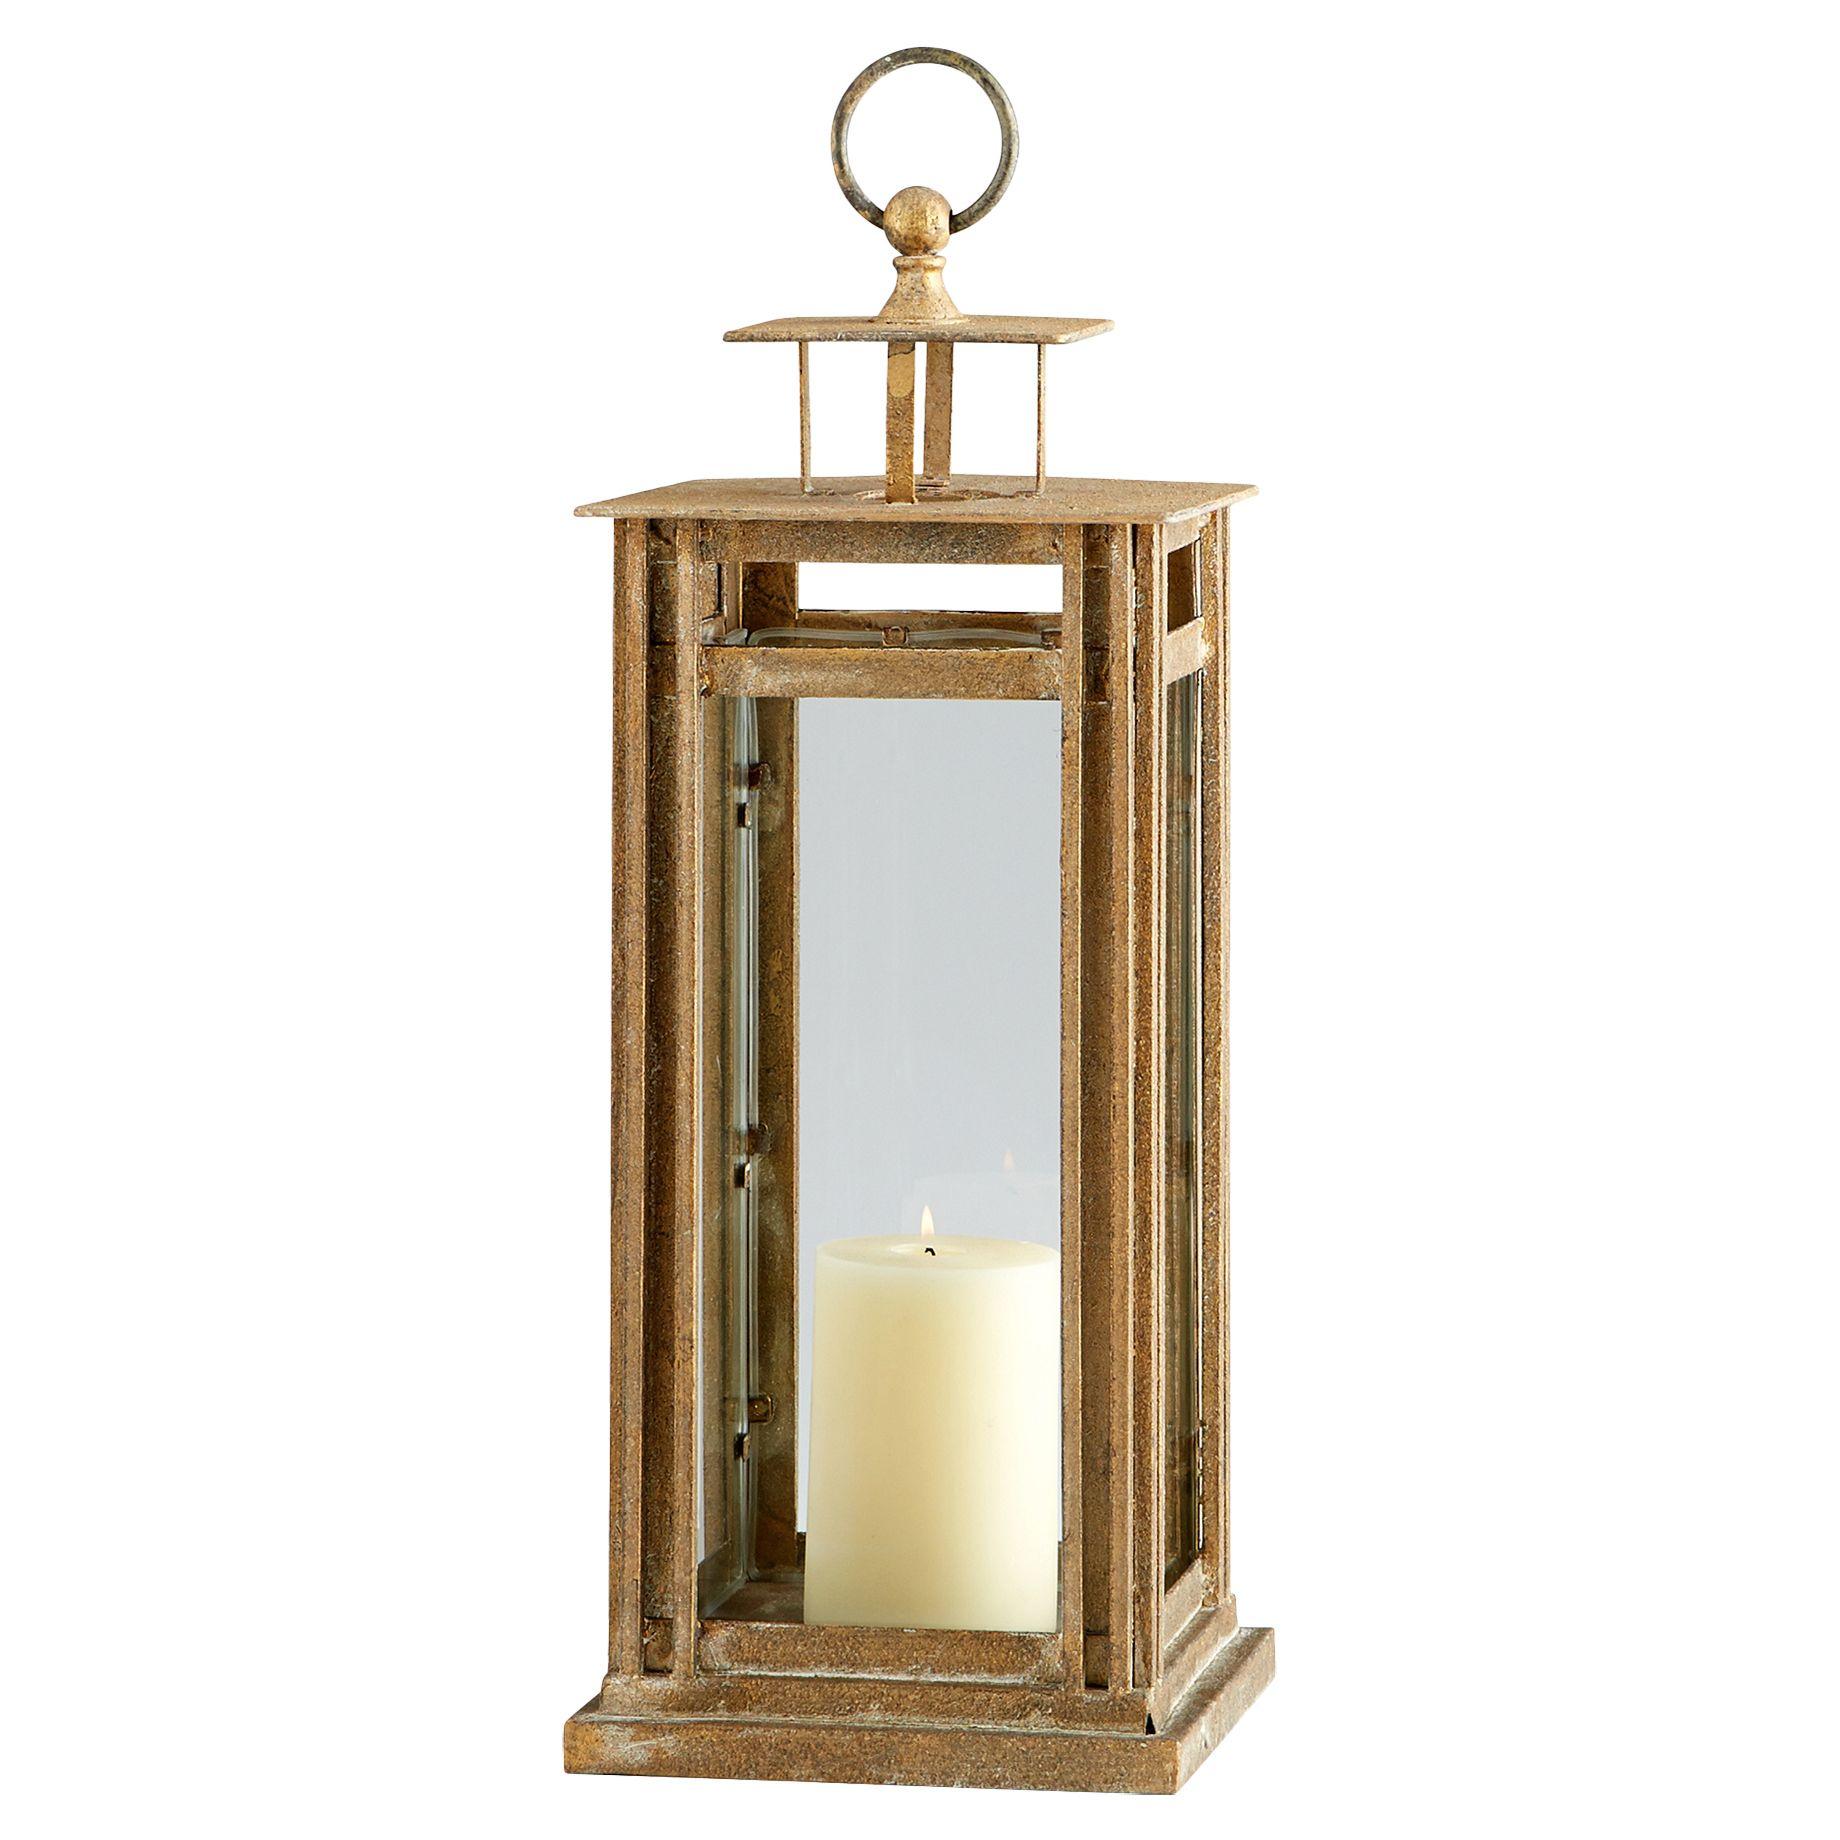 Abe Rustic Lodge Antique Gold Iron Glass Lantern Candleholder - Small